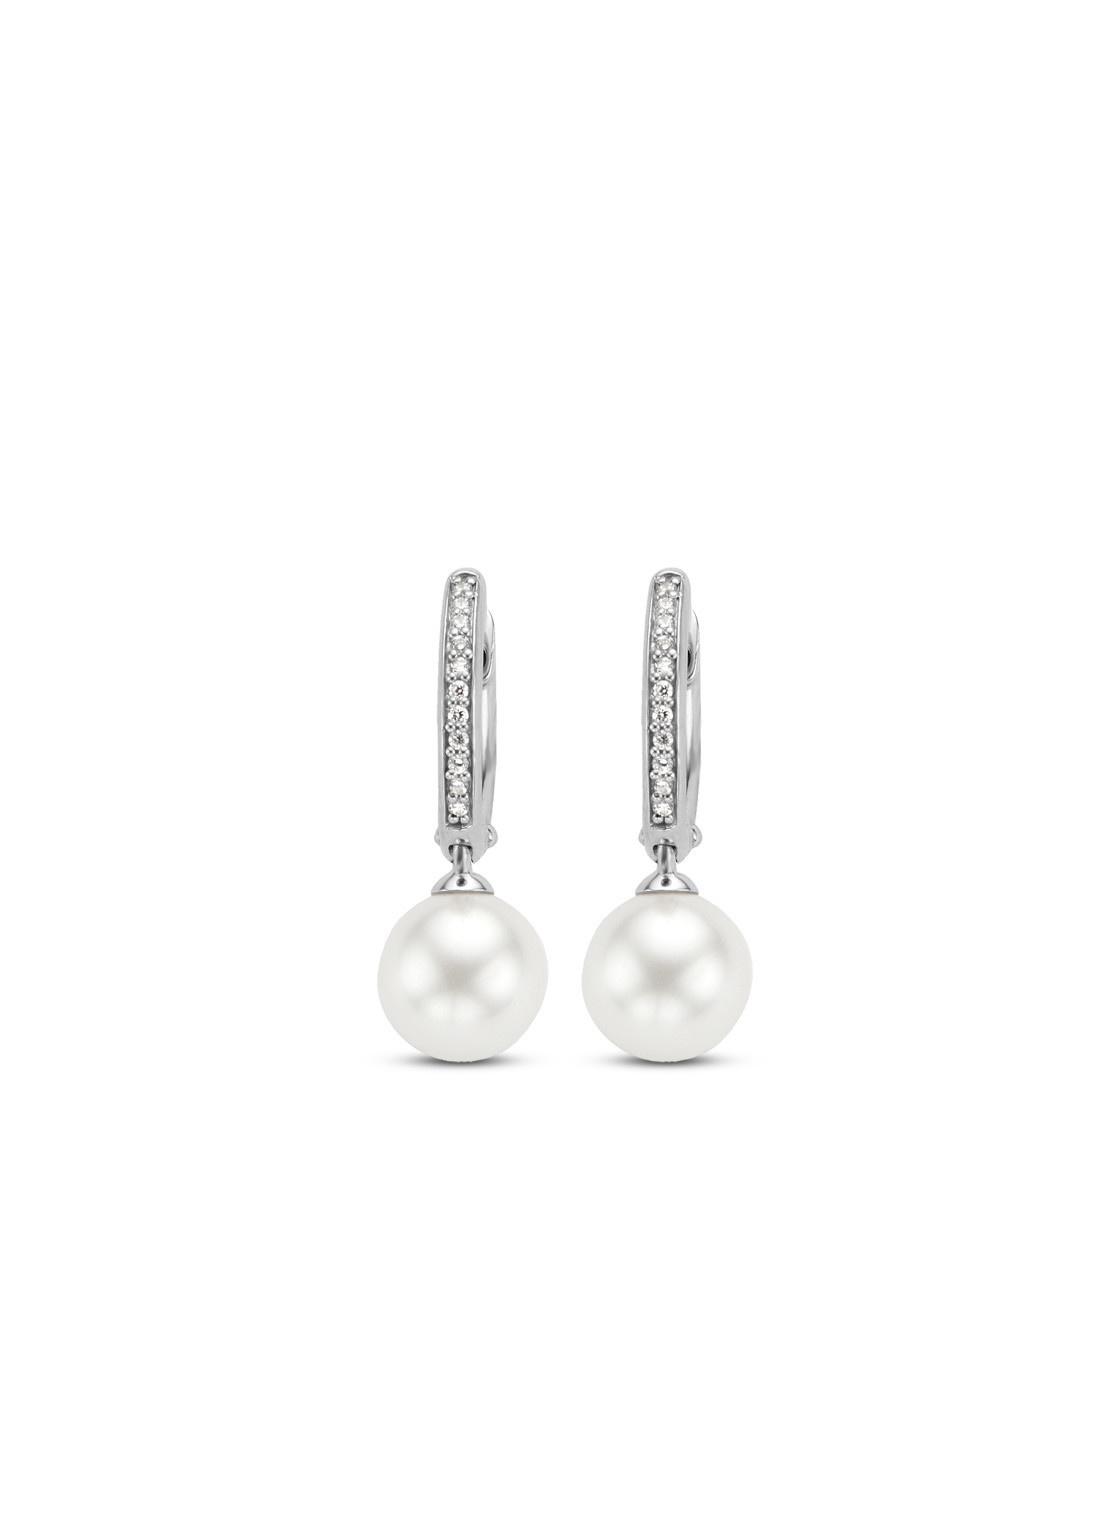 TI SENTO - Milano Earrings 7696PW-2